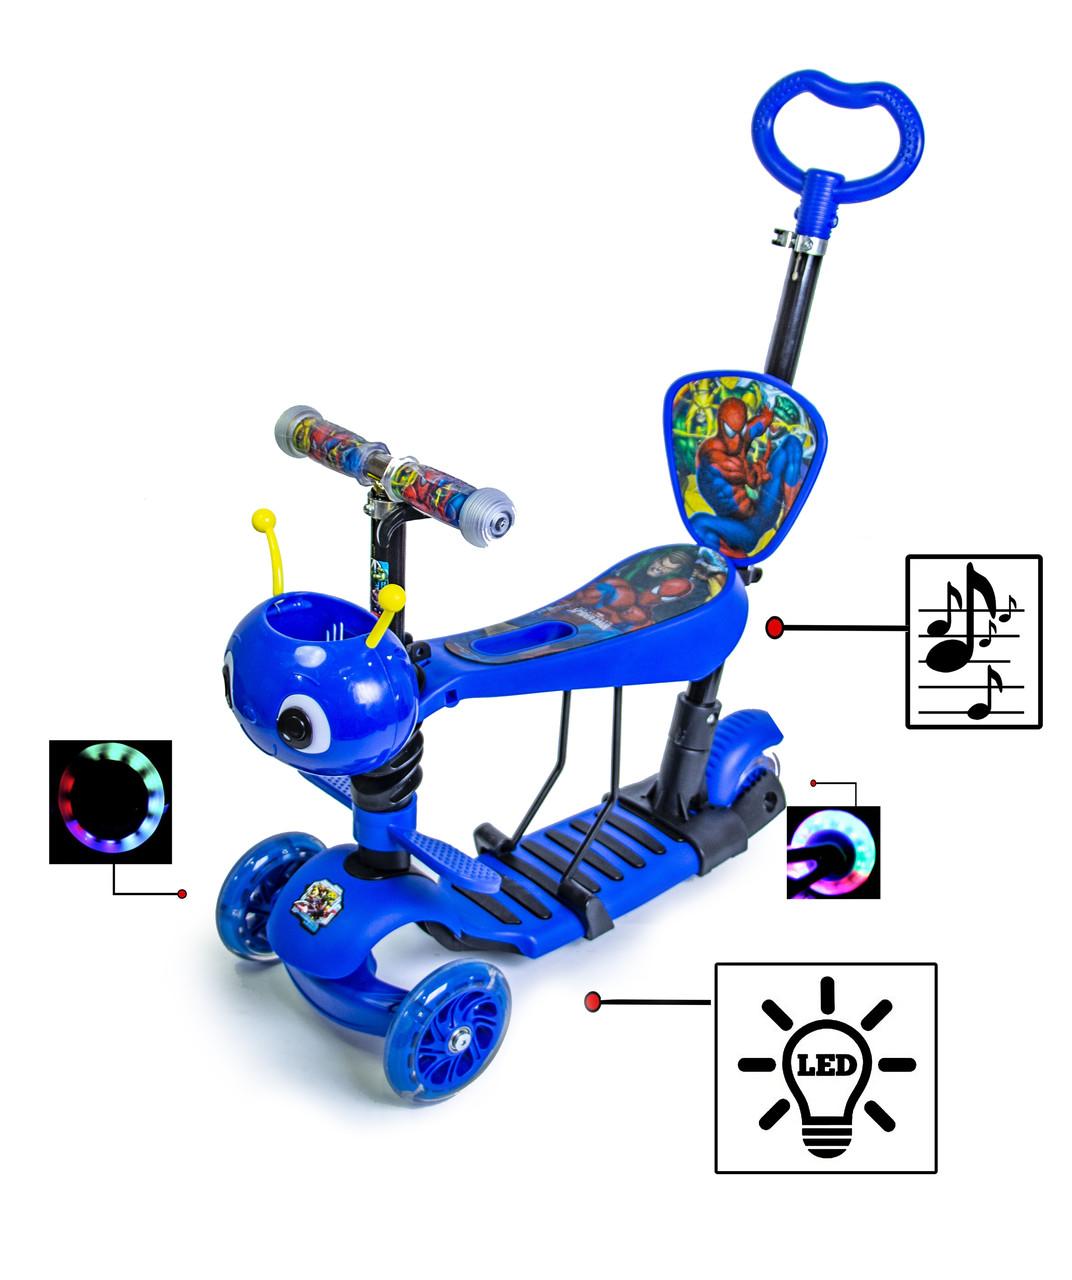 "Самокат Scooter ""Пчелка"" 5in1. Спайдермен. Blue. со светом и музыкой!"